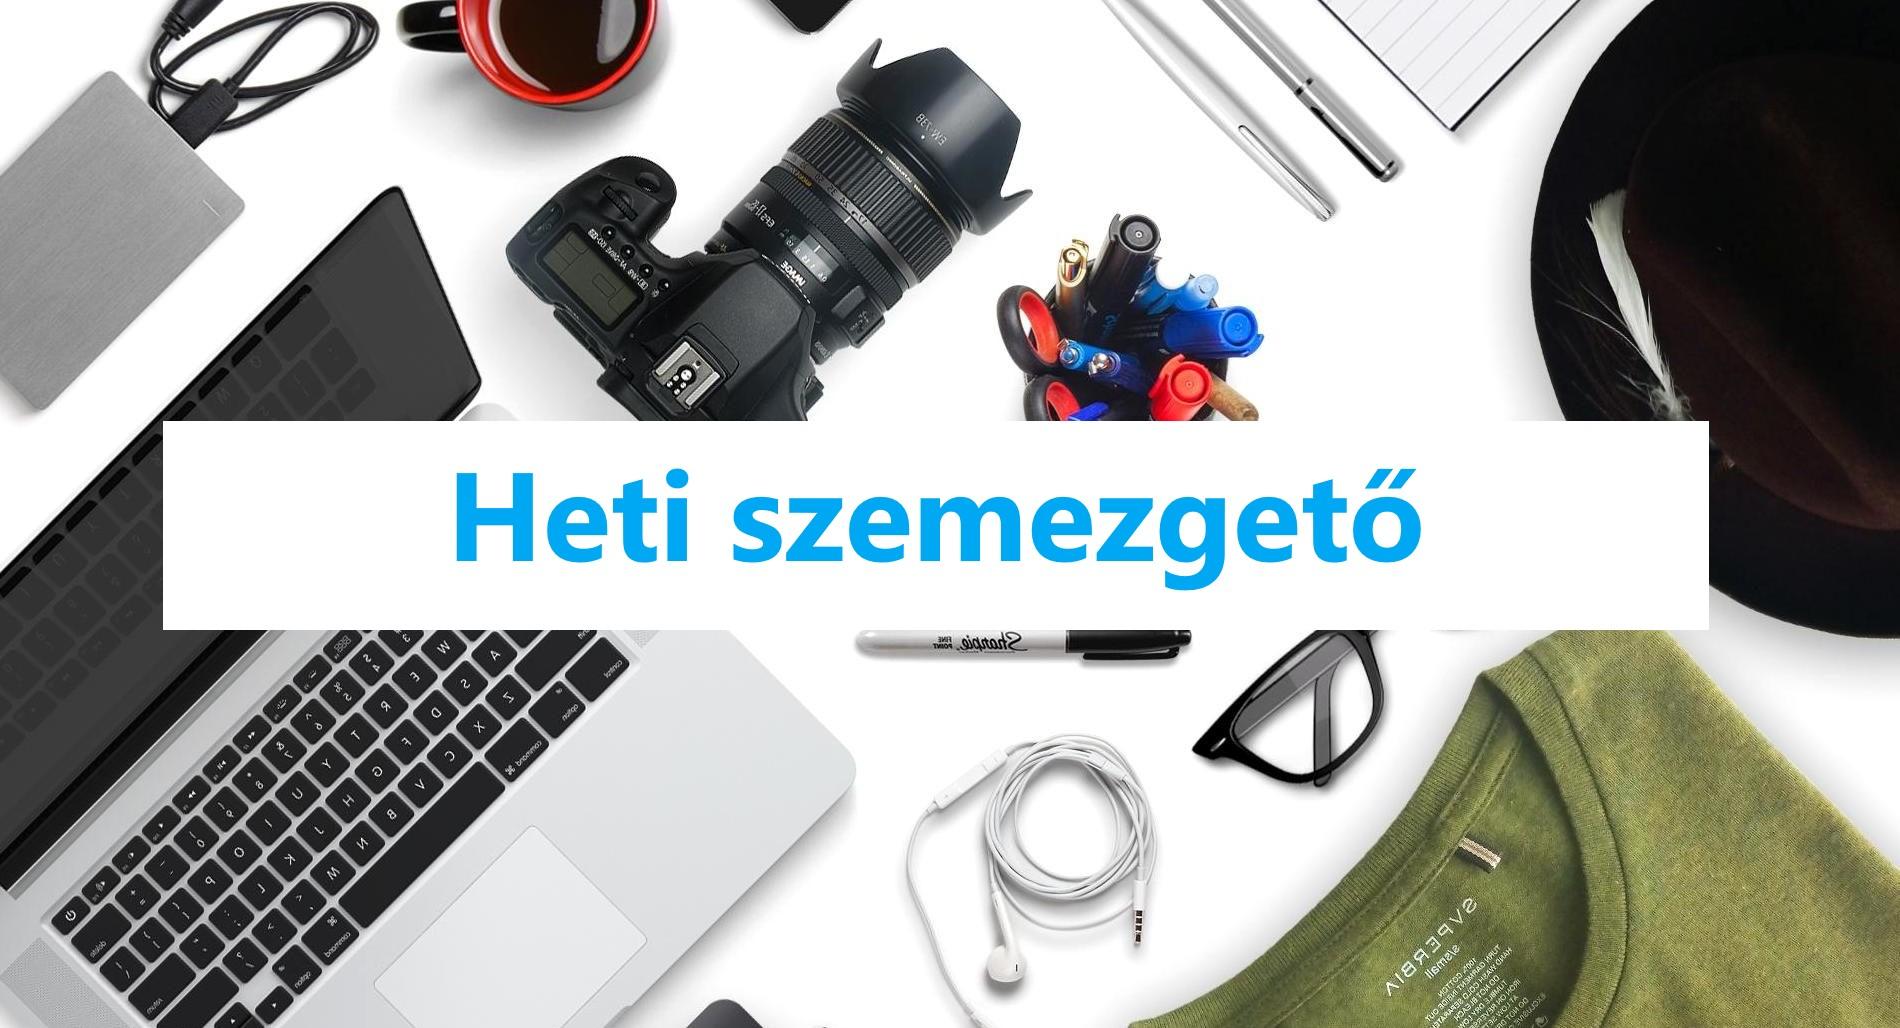 heti_szemezgeto_uj_26.jpg